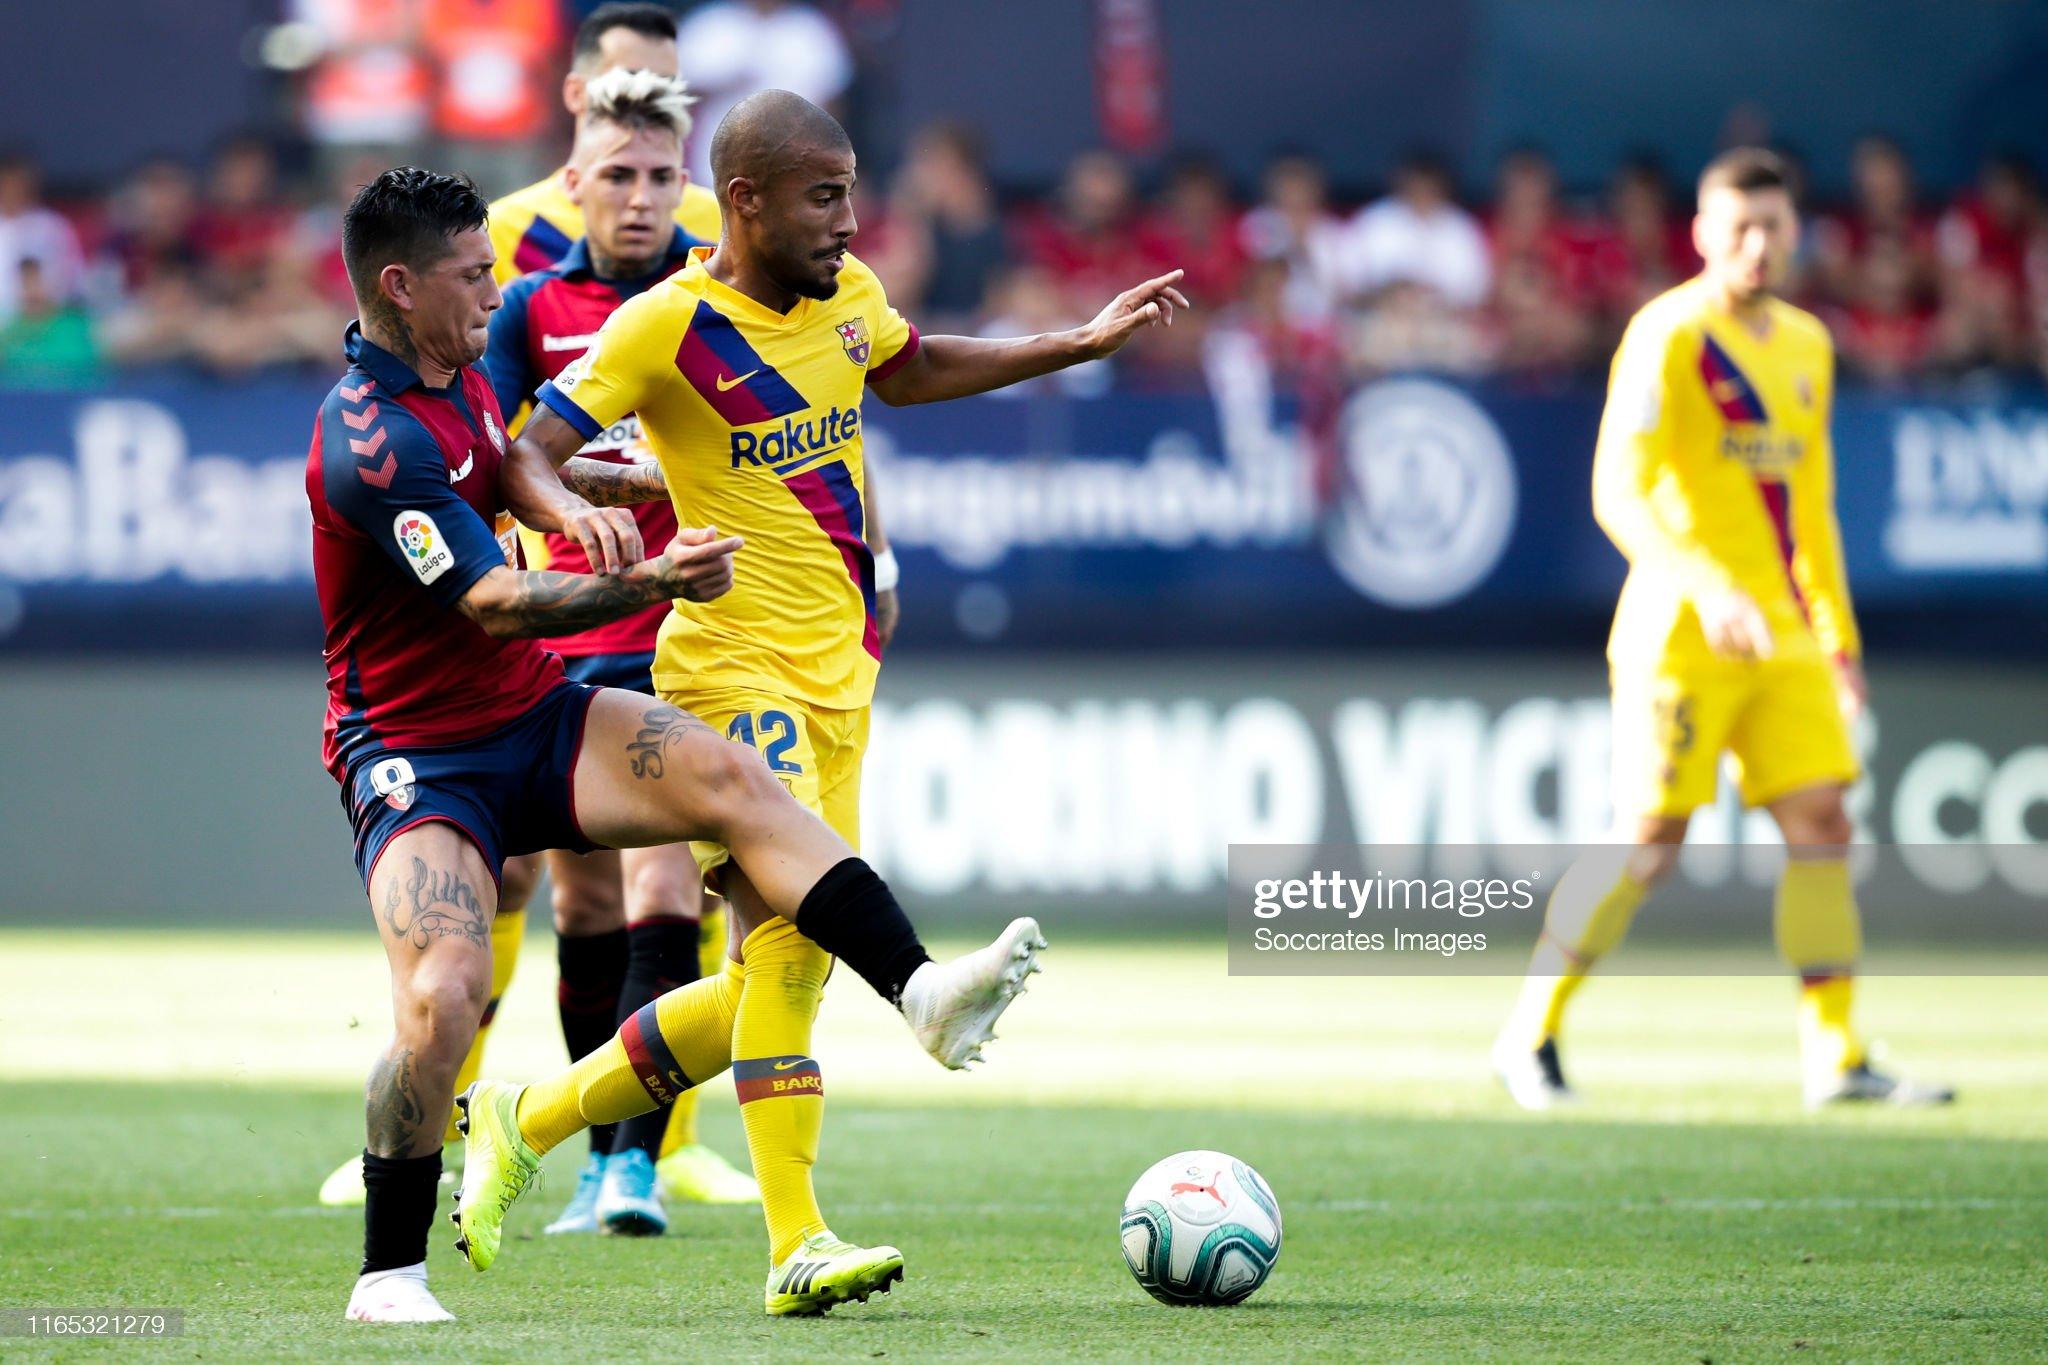 صور مباراة : أوساسونا - برشلونة 2-2 ( 31-08-2019 )  Chimy-avila-of-ca-osasuna-rafinha-of-fc-barcelona-during-the-la-liga-picture-id1165321279?s=2048x2048